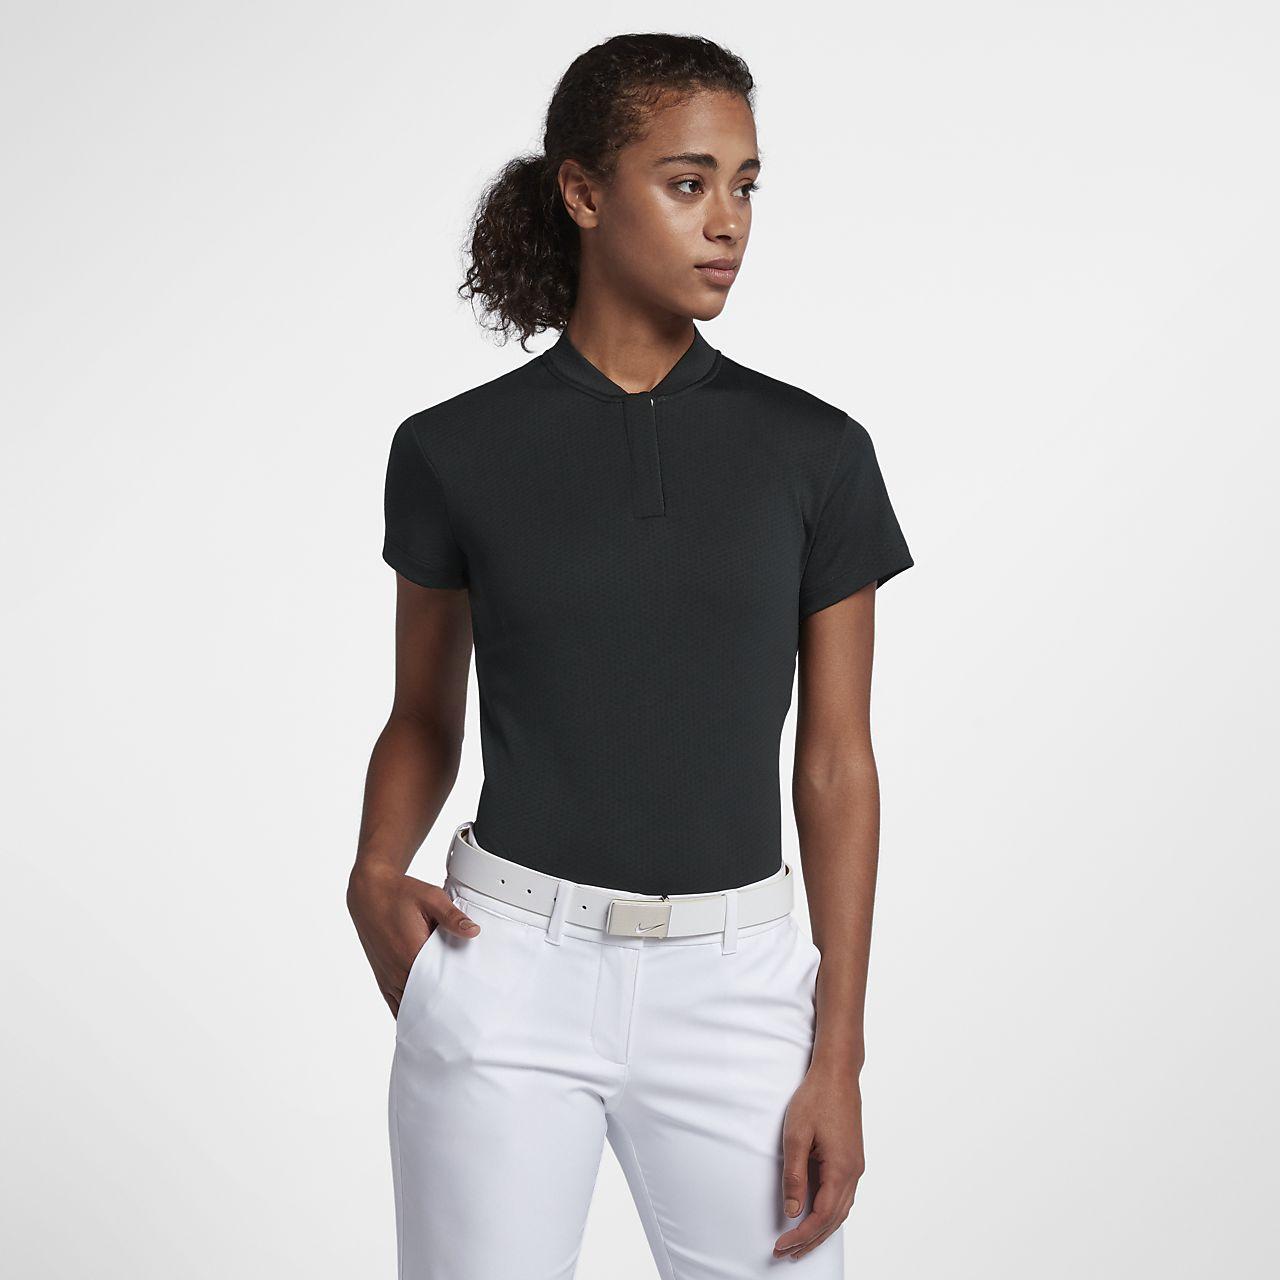 ... Nike Dri-FIT Women's Golf Polo